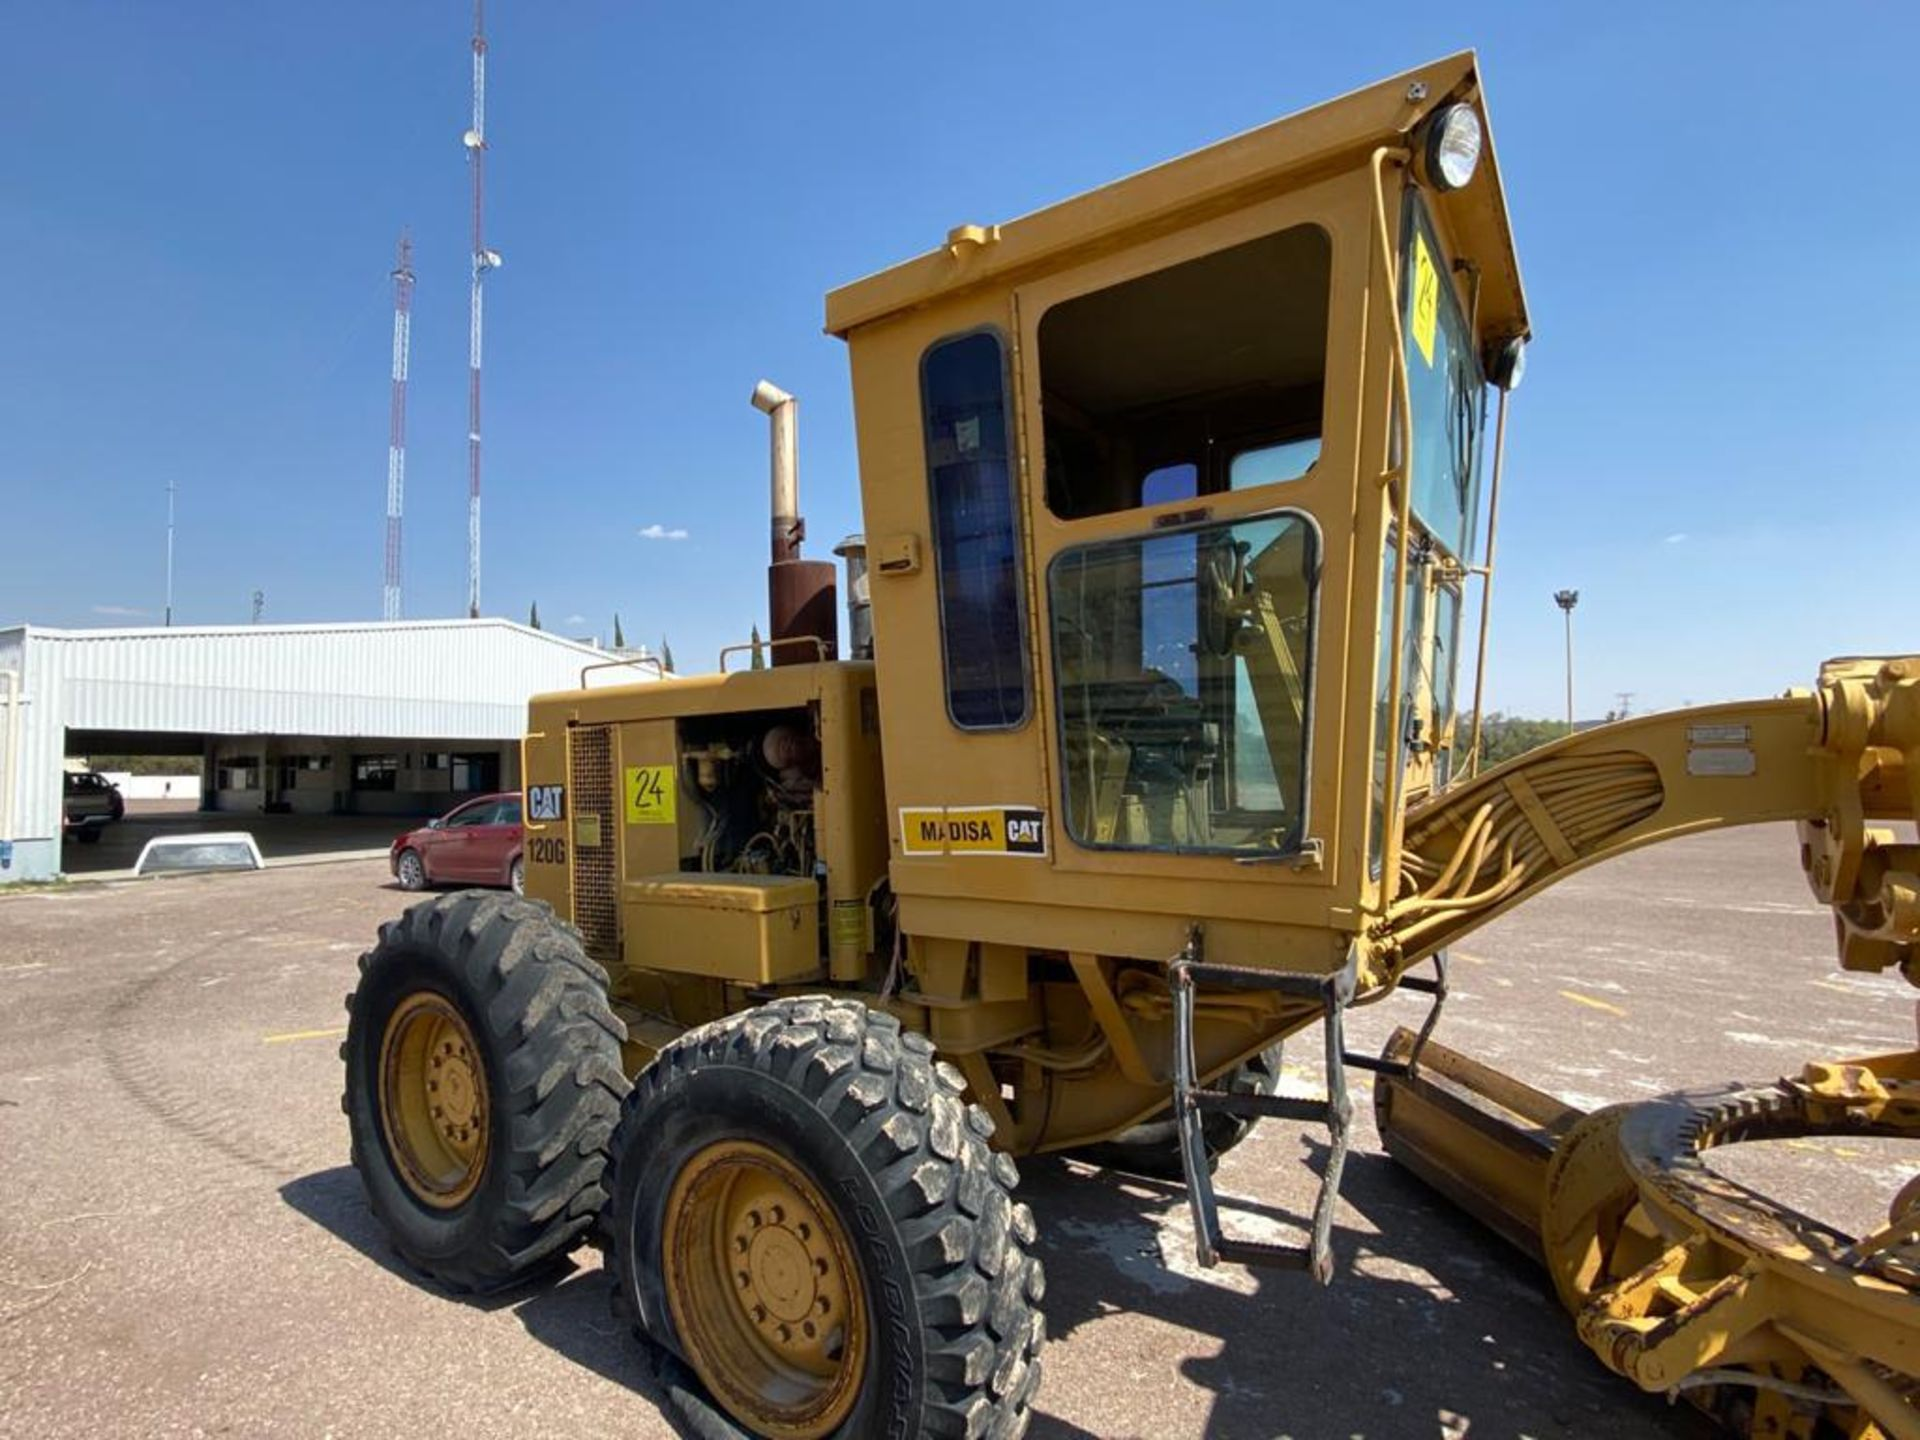 Caterpillar 120G Motor Grader, Serial number 87V09646, Motor number PQ883-2/07Z28983 - Image 20 of 61